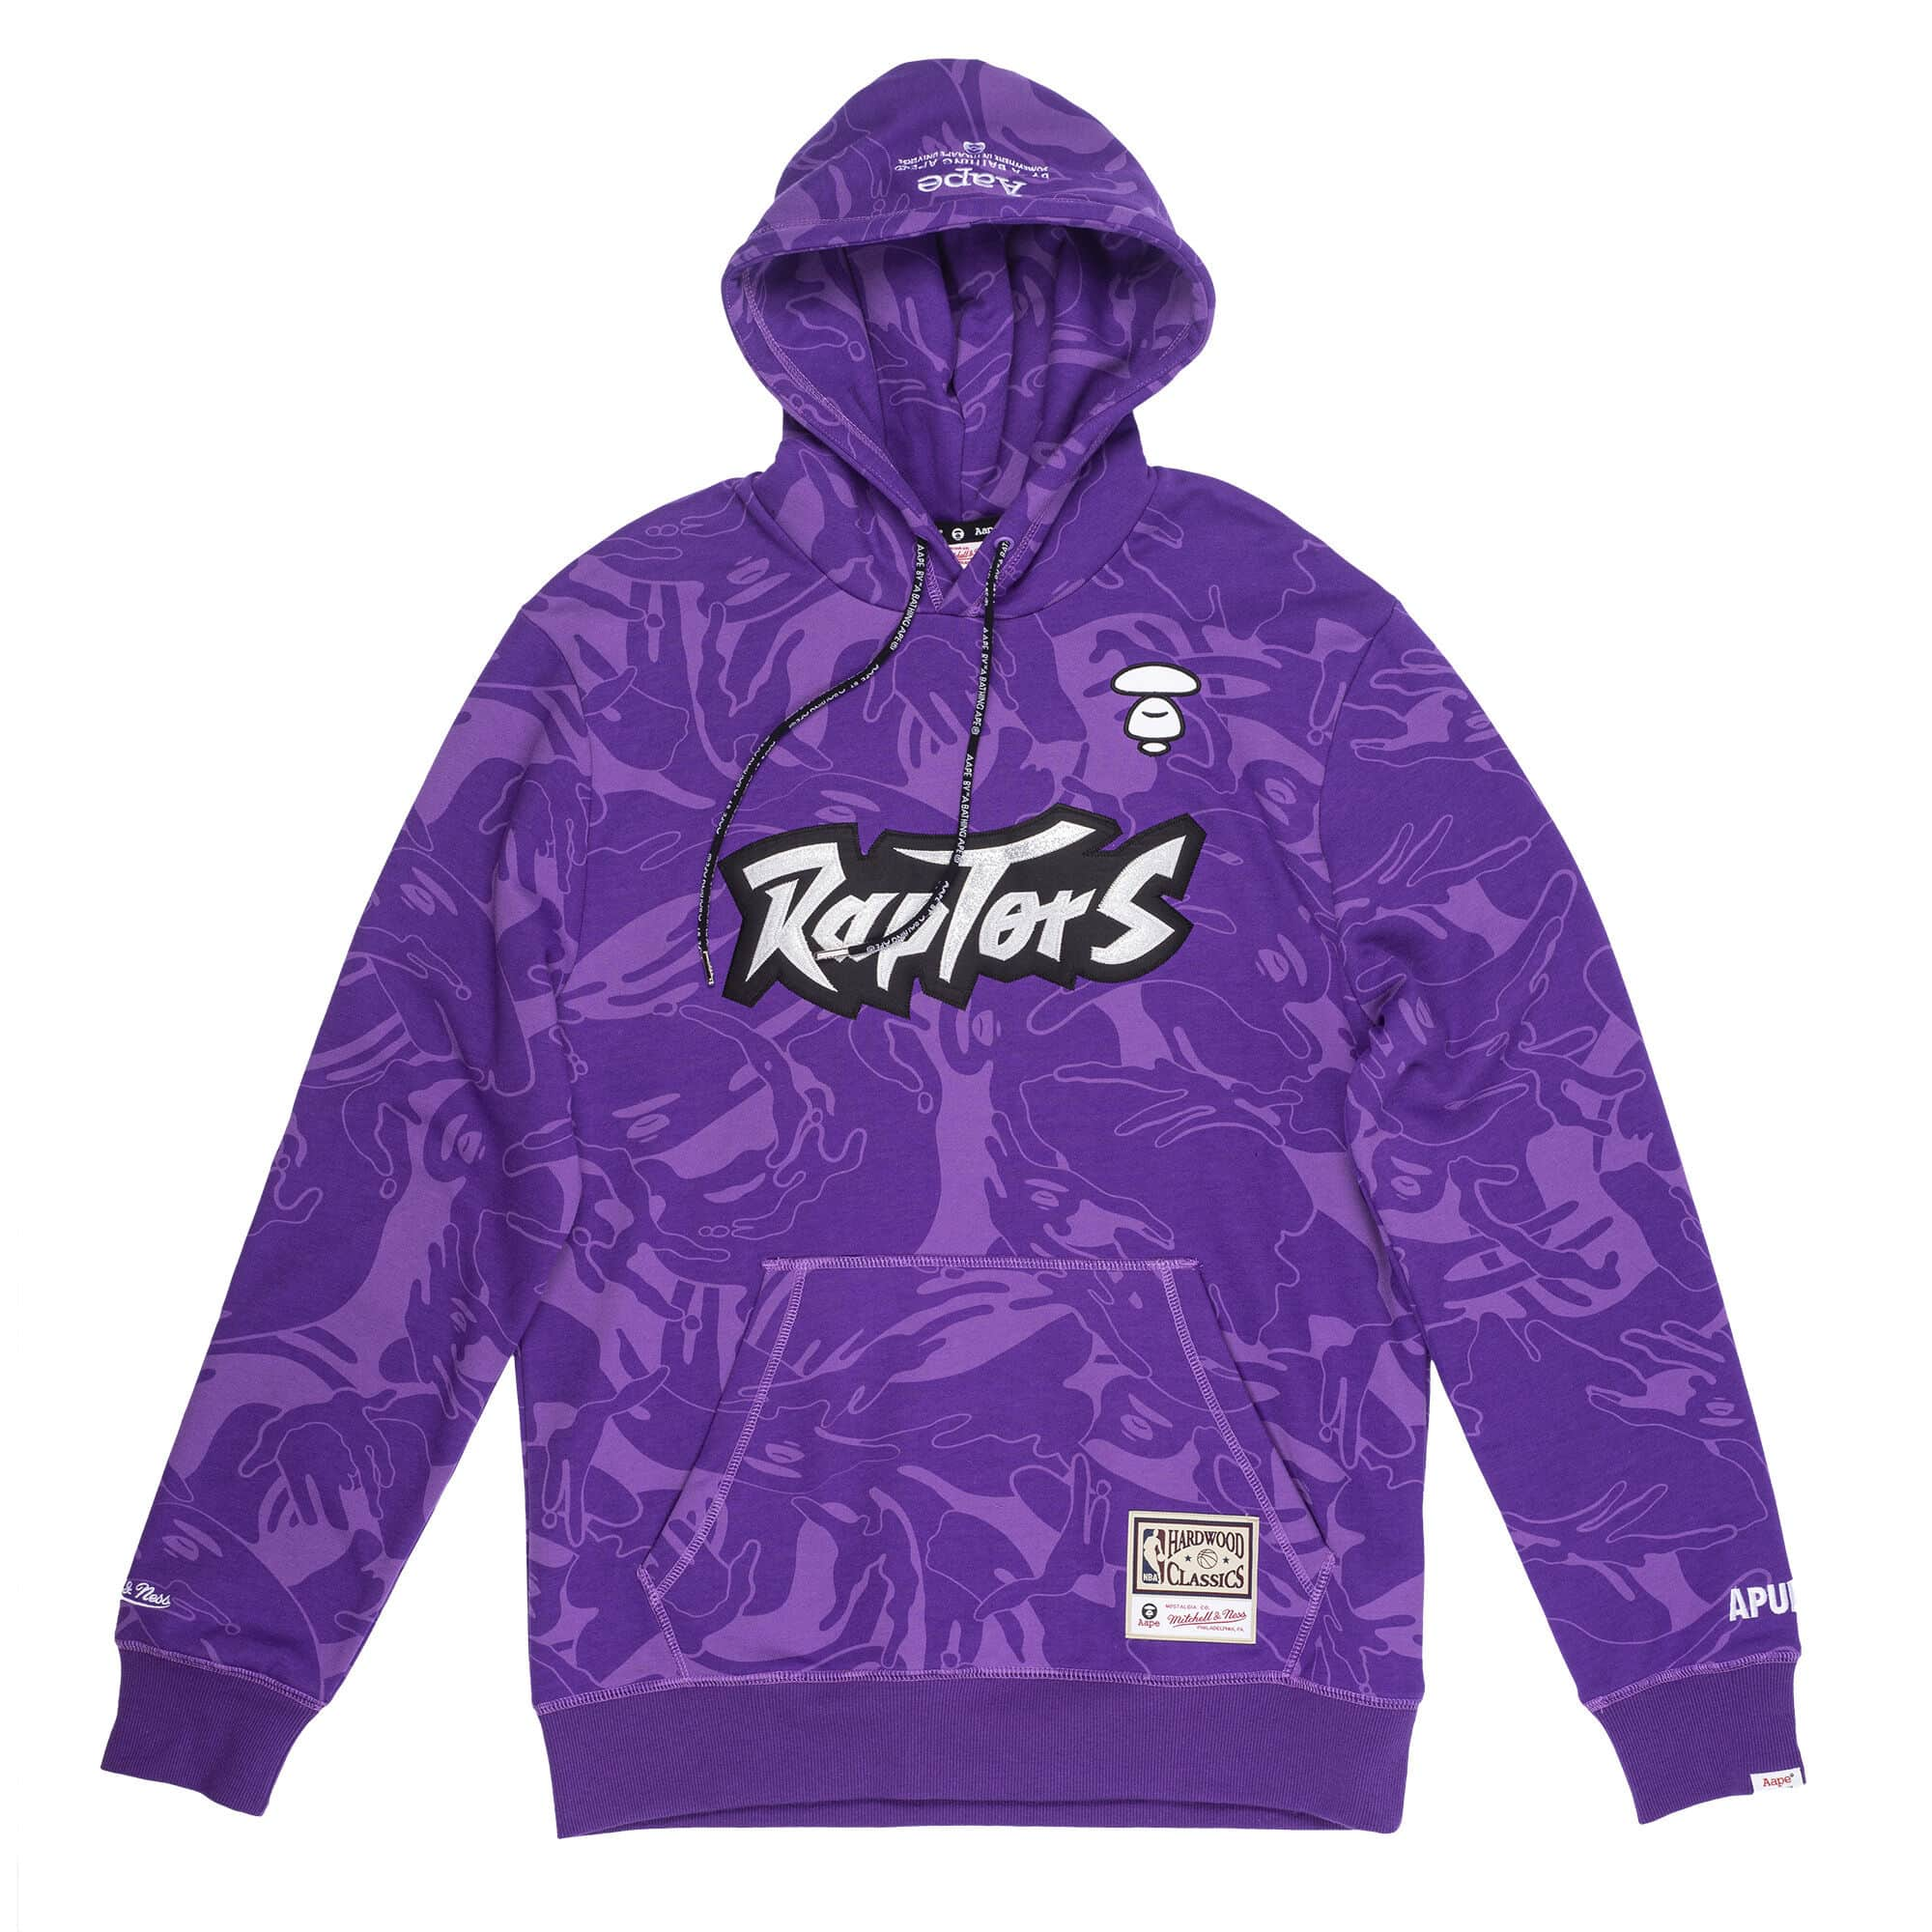 Aape x Mitchell Ness Toronto Raptors Hoodie Purple